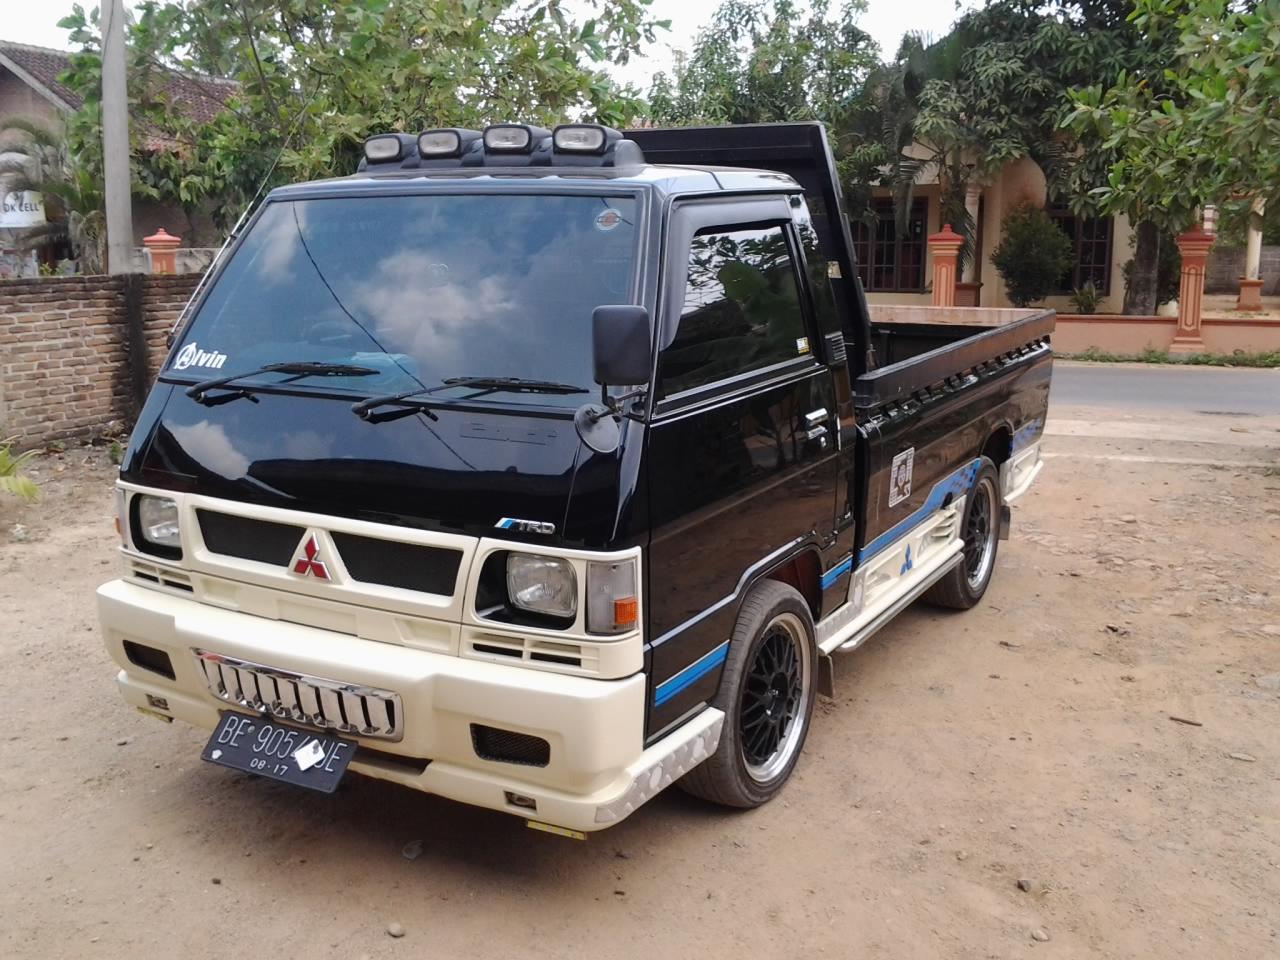 Modif Pelek Suzuki Carry Pick Up - Jual Velg Mobil Surabaya